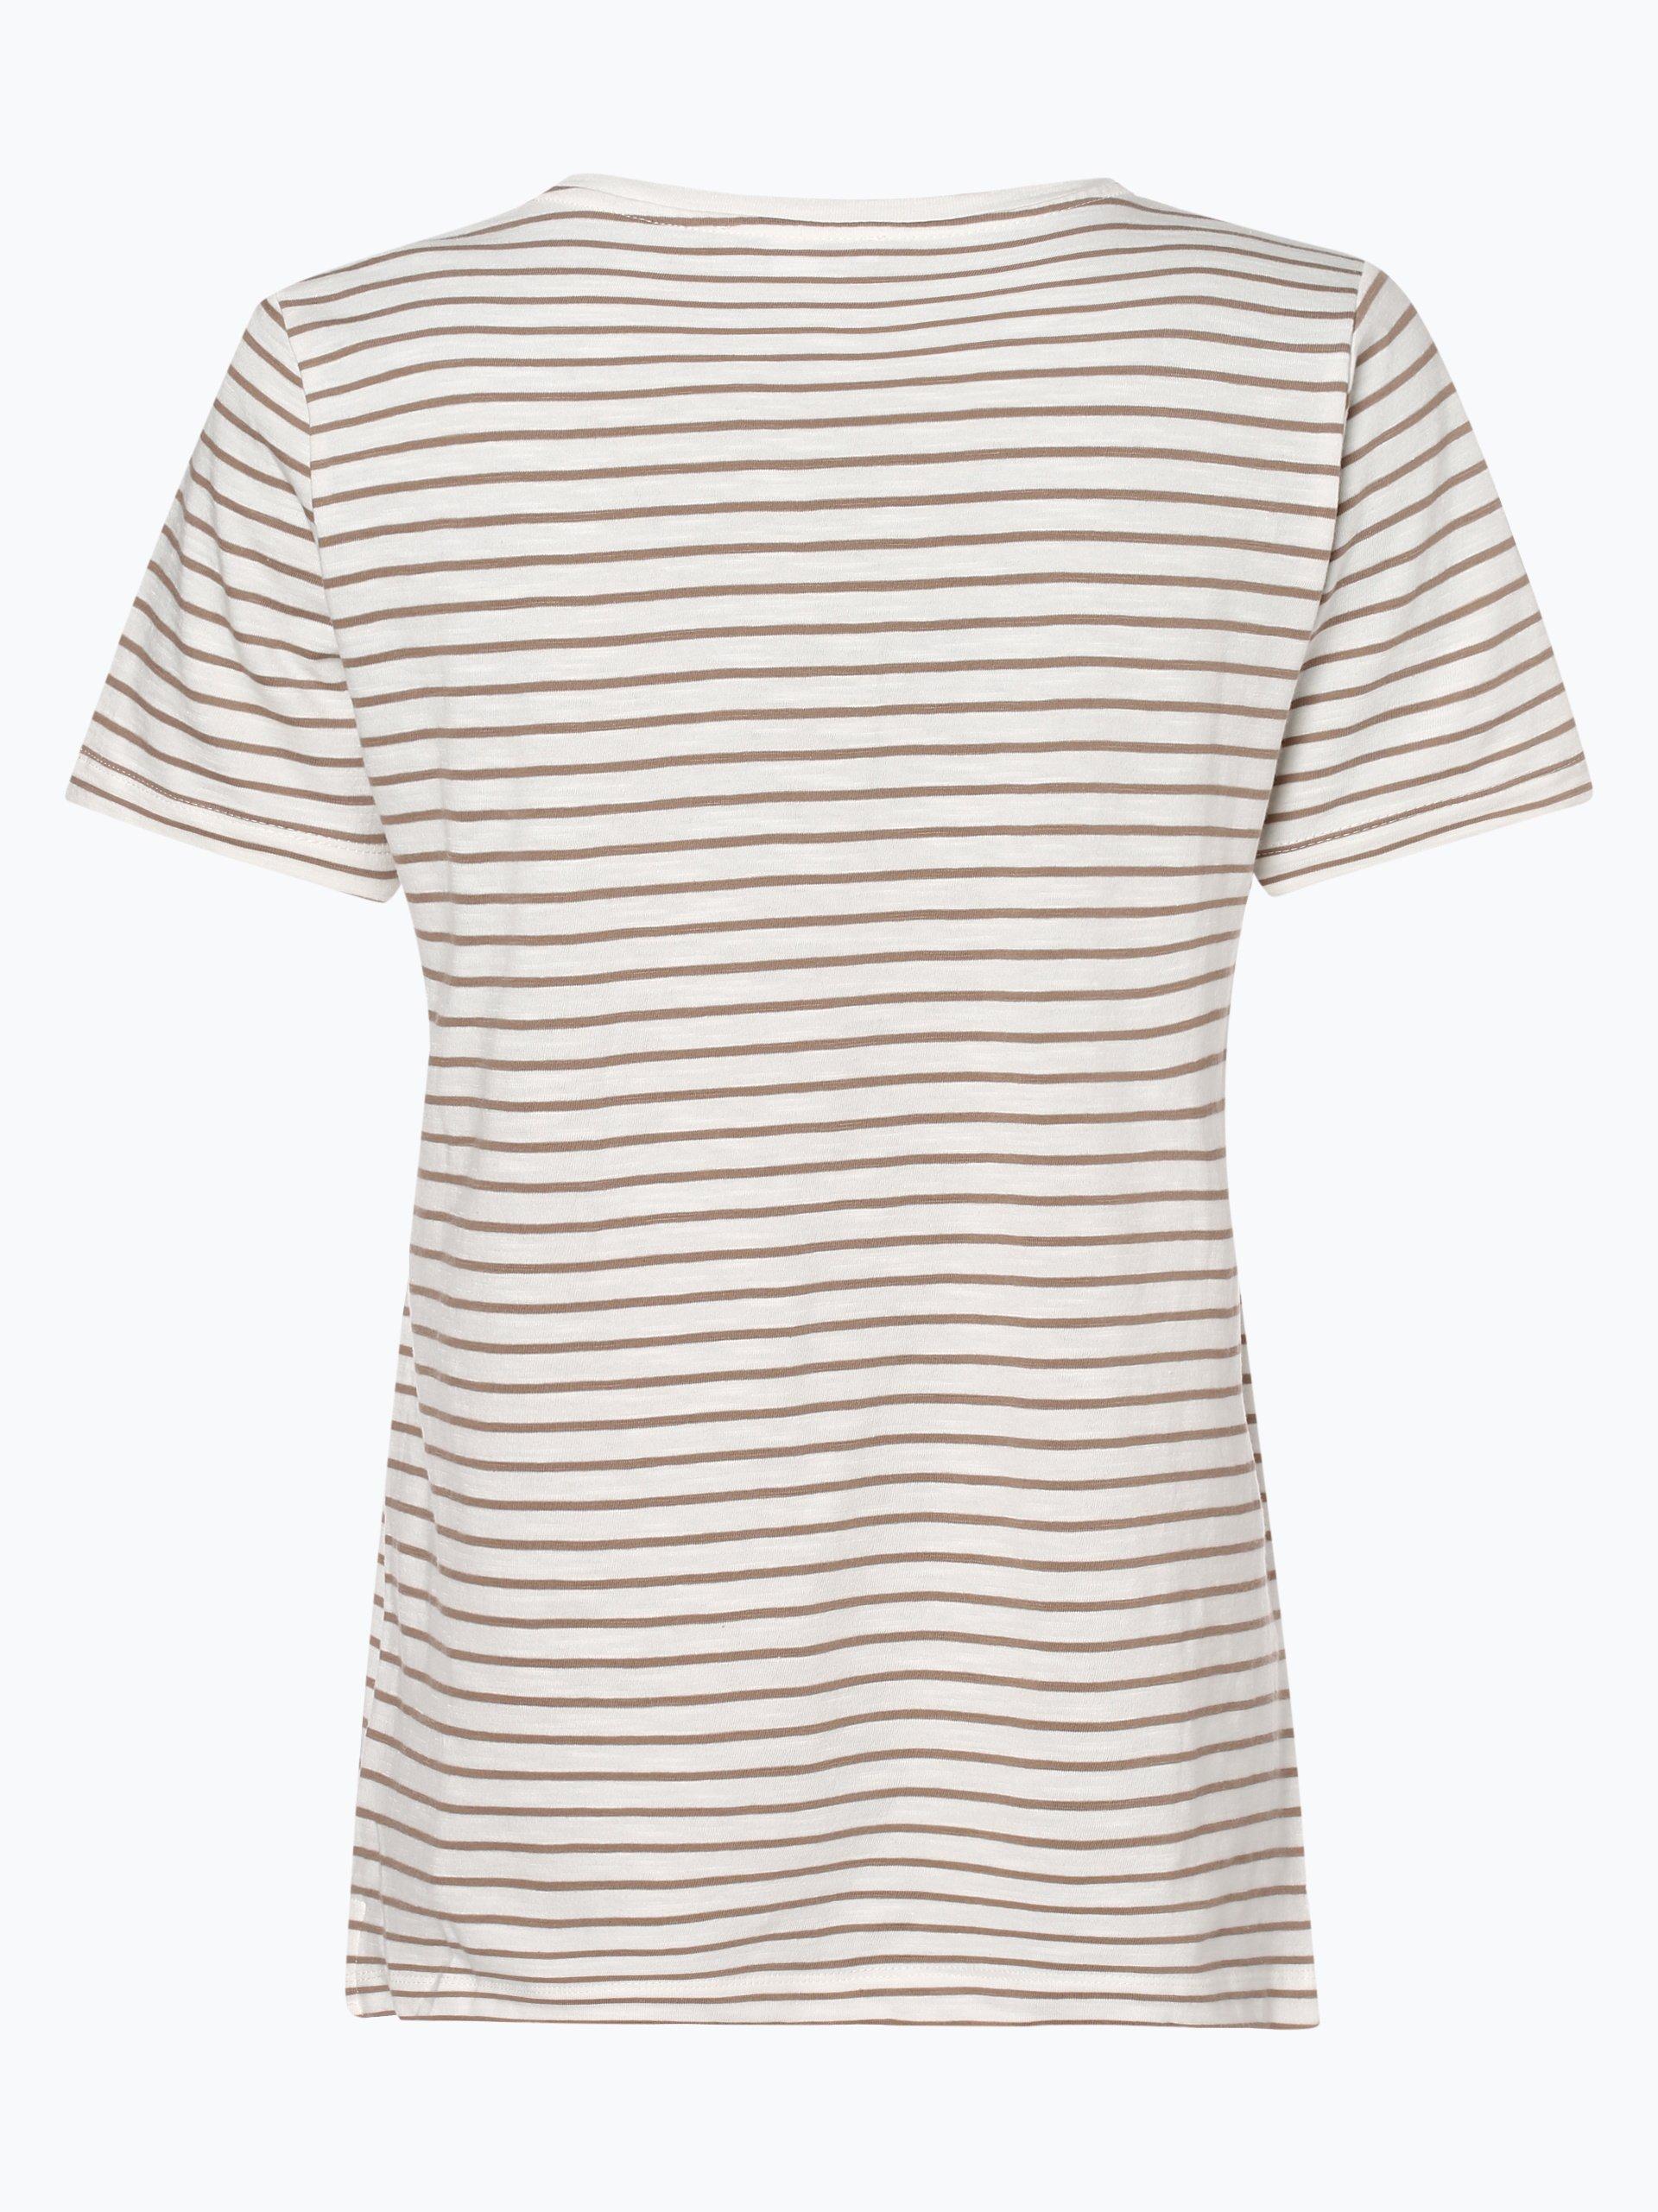 Marie Lund T-shirt damski